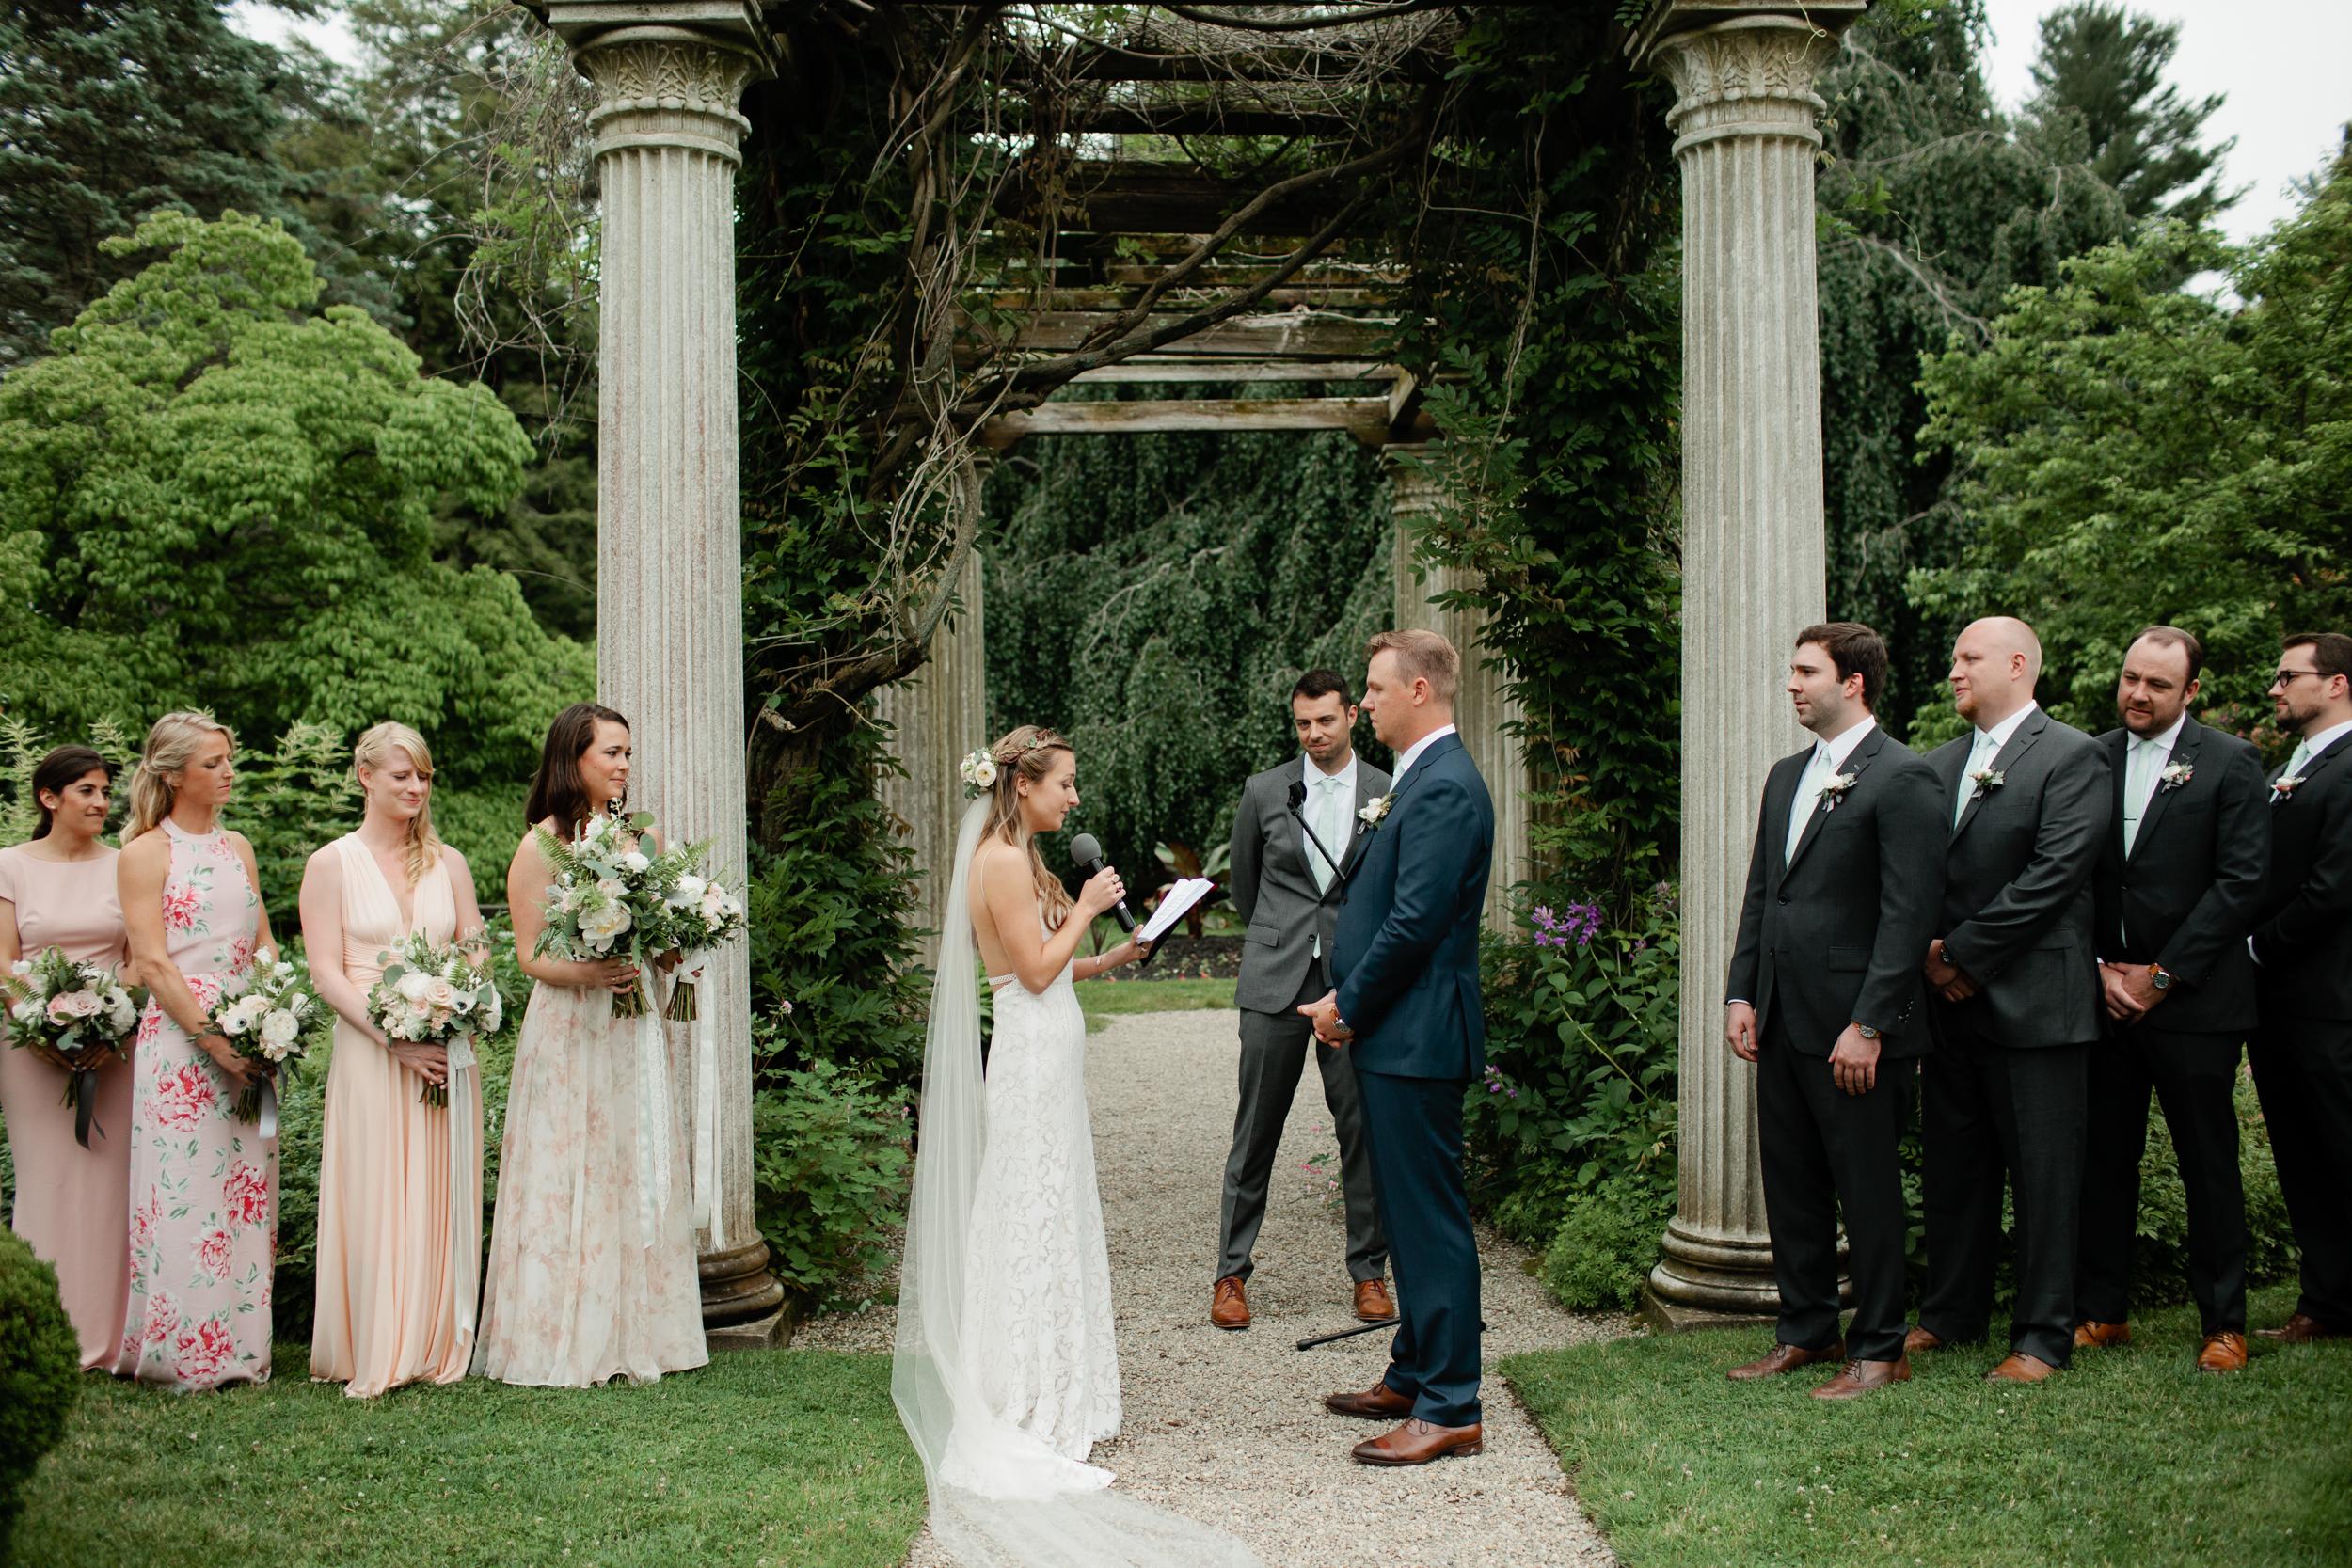 Best-Maine-Wedding-Photographer-133.jpg